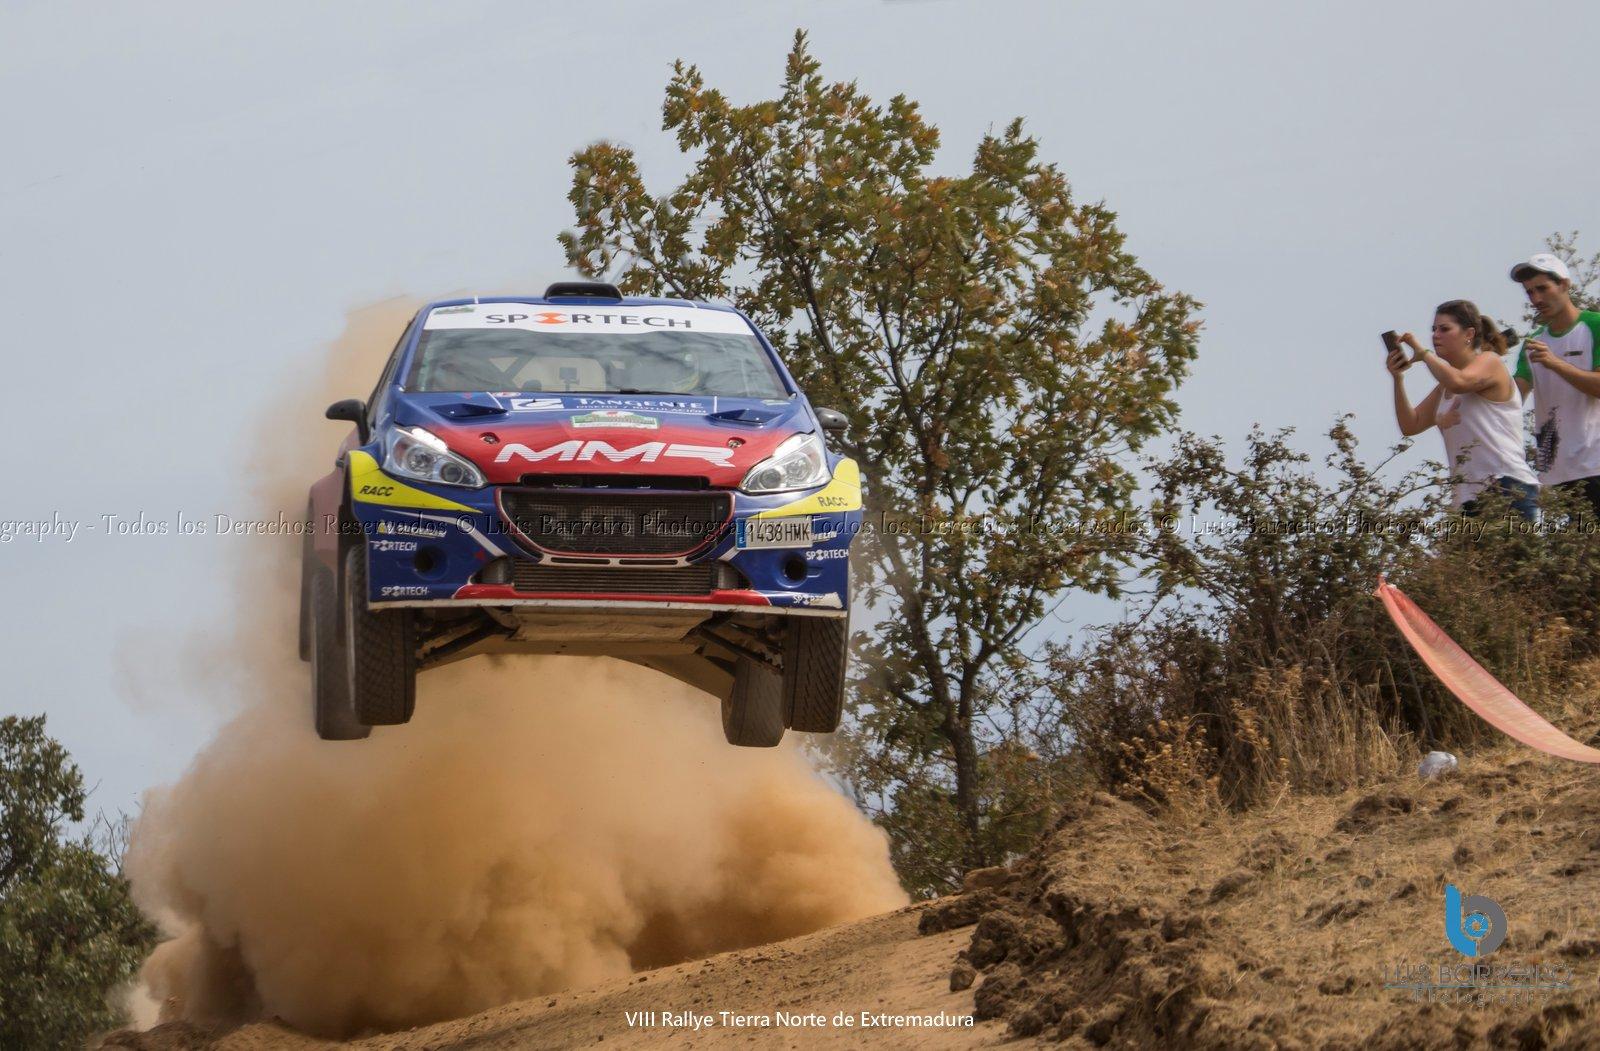 VIII Rallye Tierra Norte Extremadura